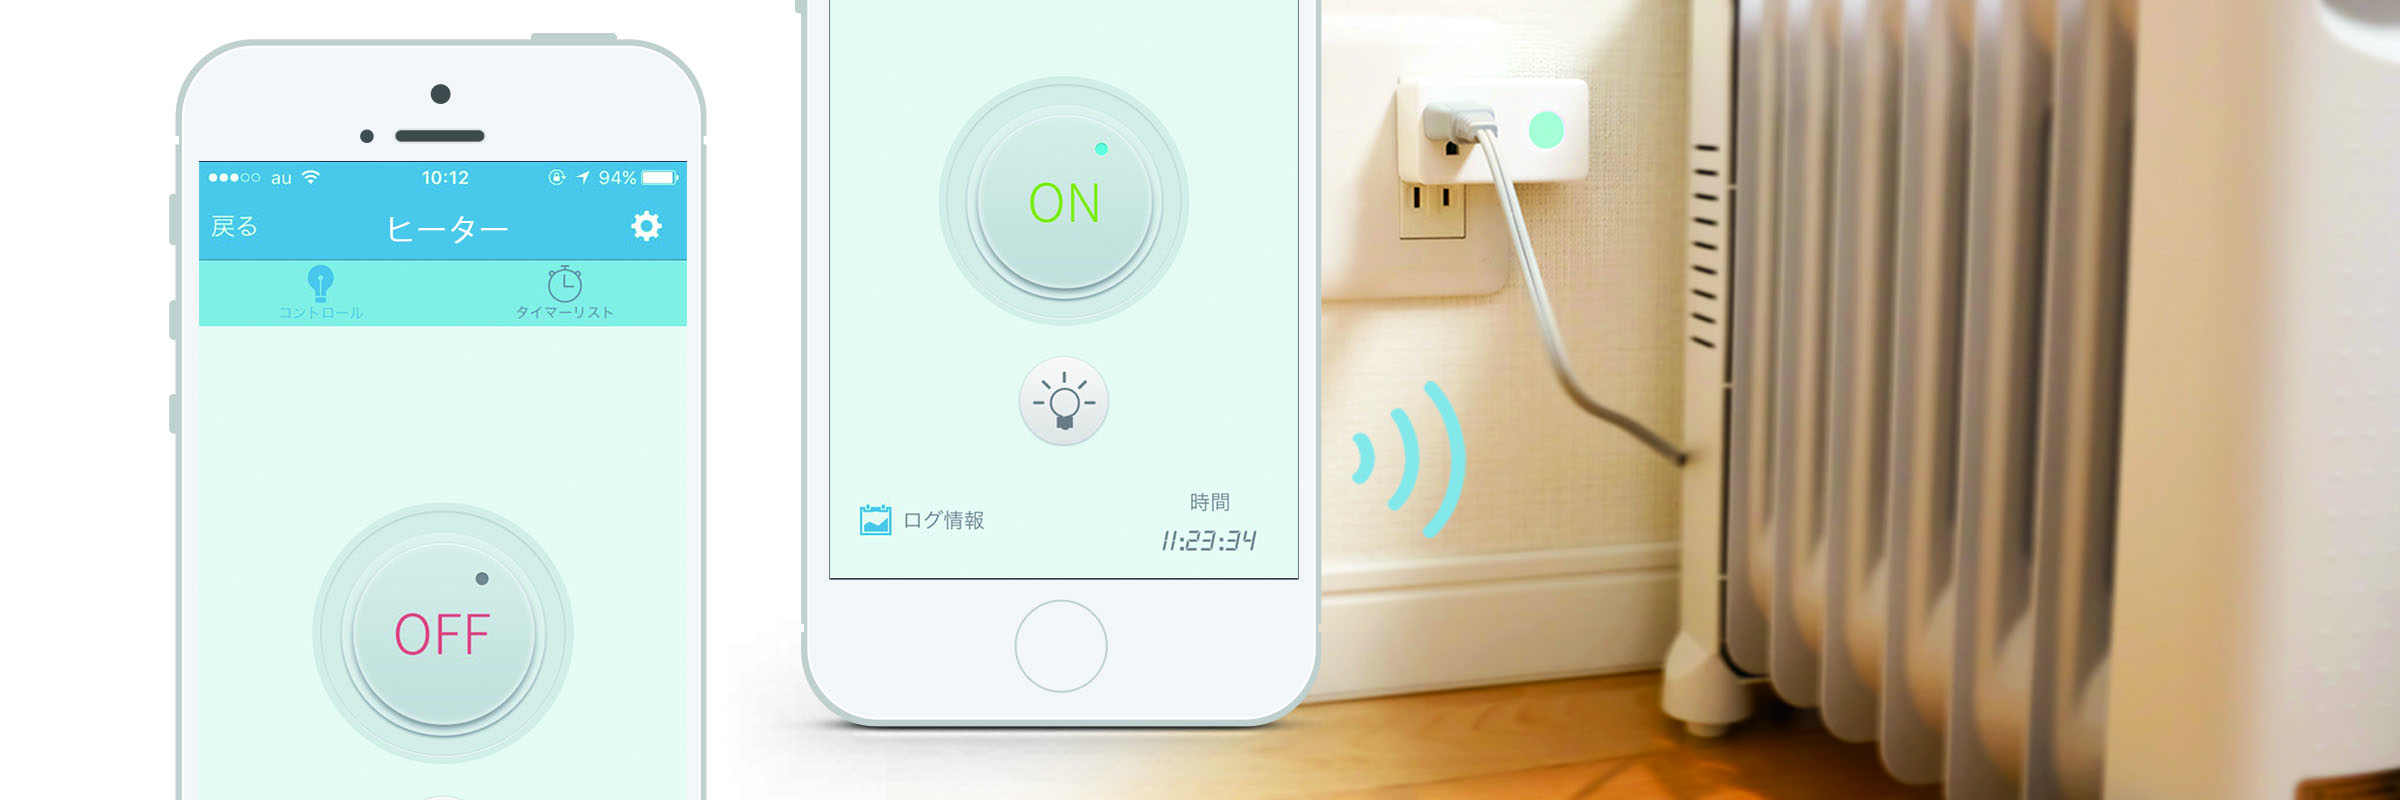 ePlug|IoT 家電 スマートホーム・スマートハウス|Link Japan画像03